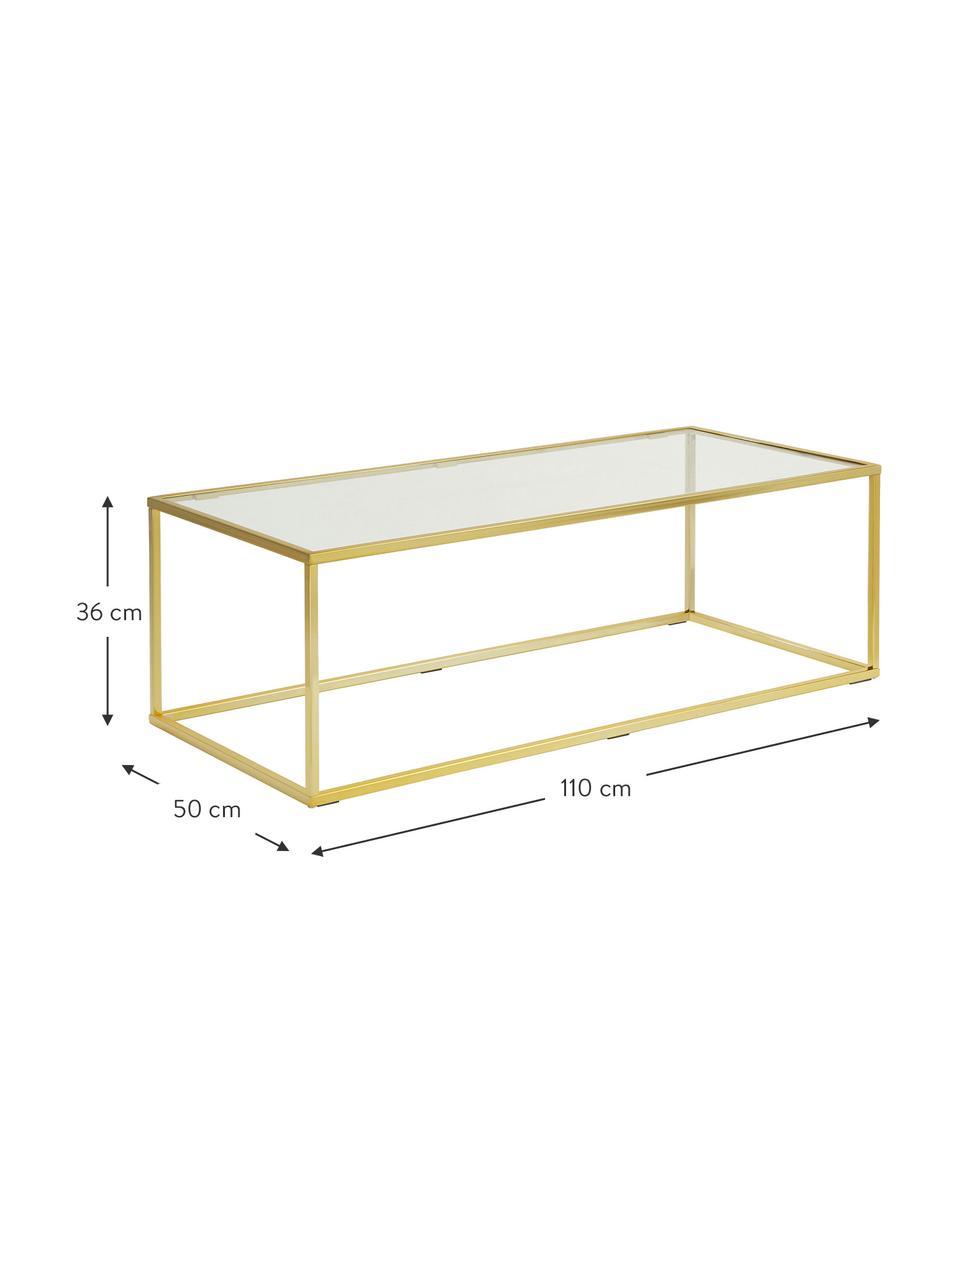 Salontafel Maya met glazen tafelblad, Tafelblad: veiligheidsglas, Frame: gegalvaniseerd metaal, Tafelblad: glas, transparant. Frame: glanzend goudkleurig, 110 x 36 cm